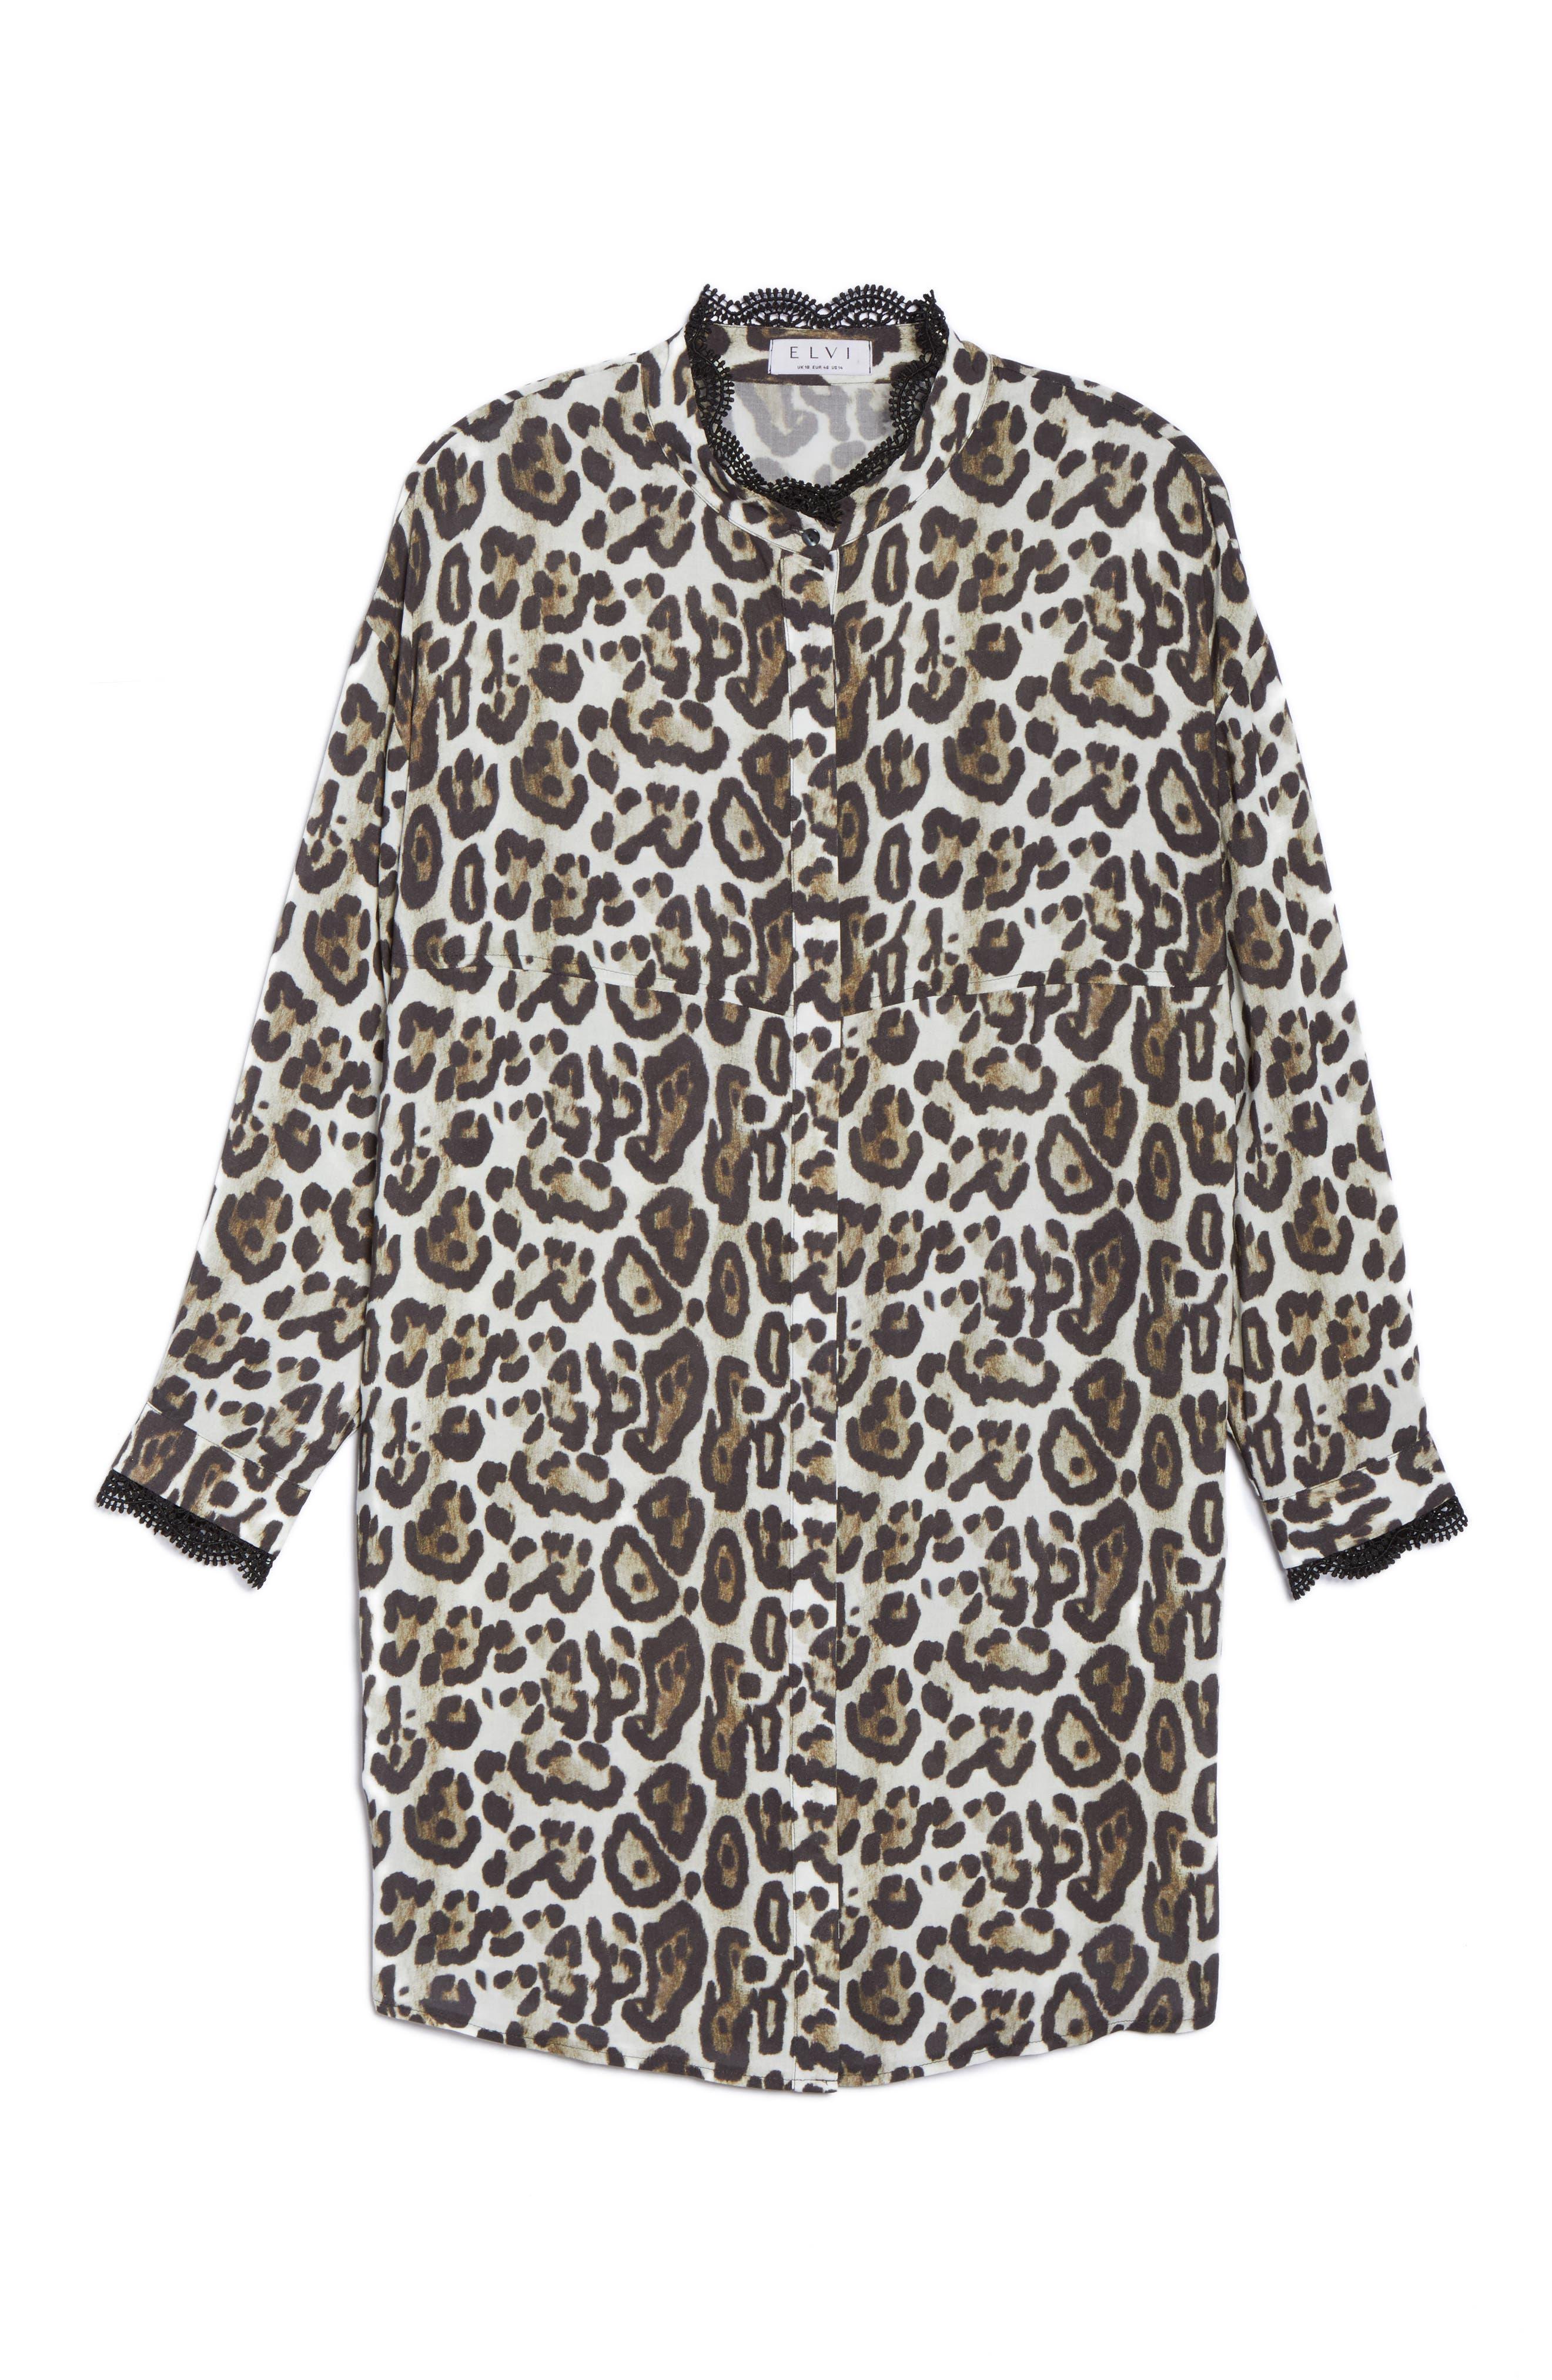 Oversize Leopard Print Blouse,                             Alternate thumbnail 6, color,                             Black/ Multi